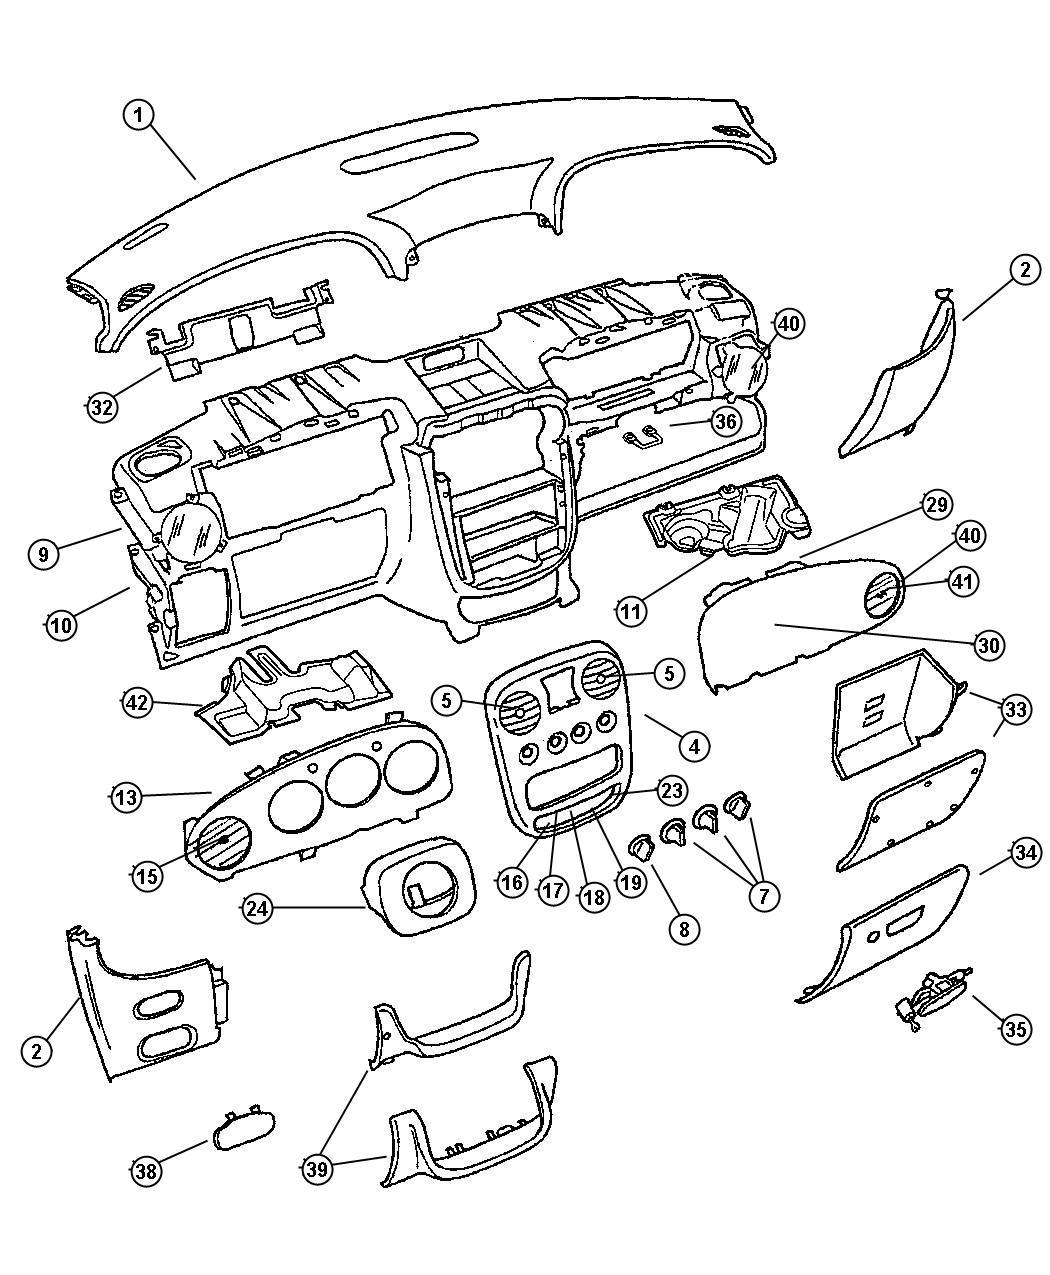 2004 Chrysler PT Cruiser Panel. Instrument panel closeout